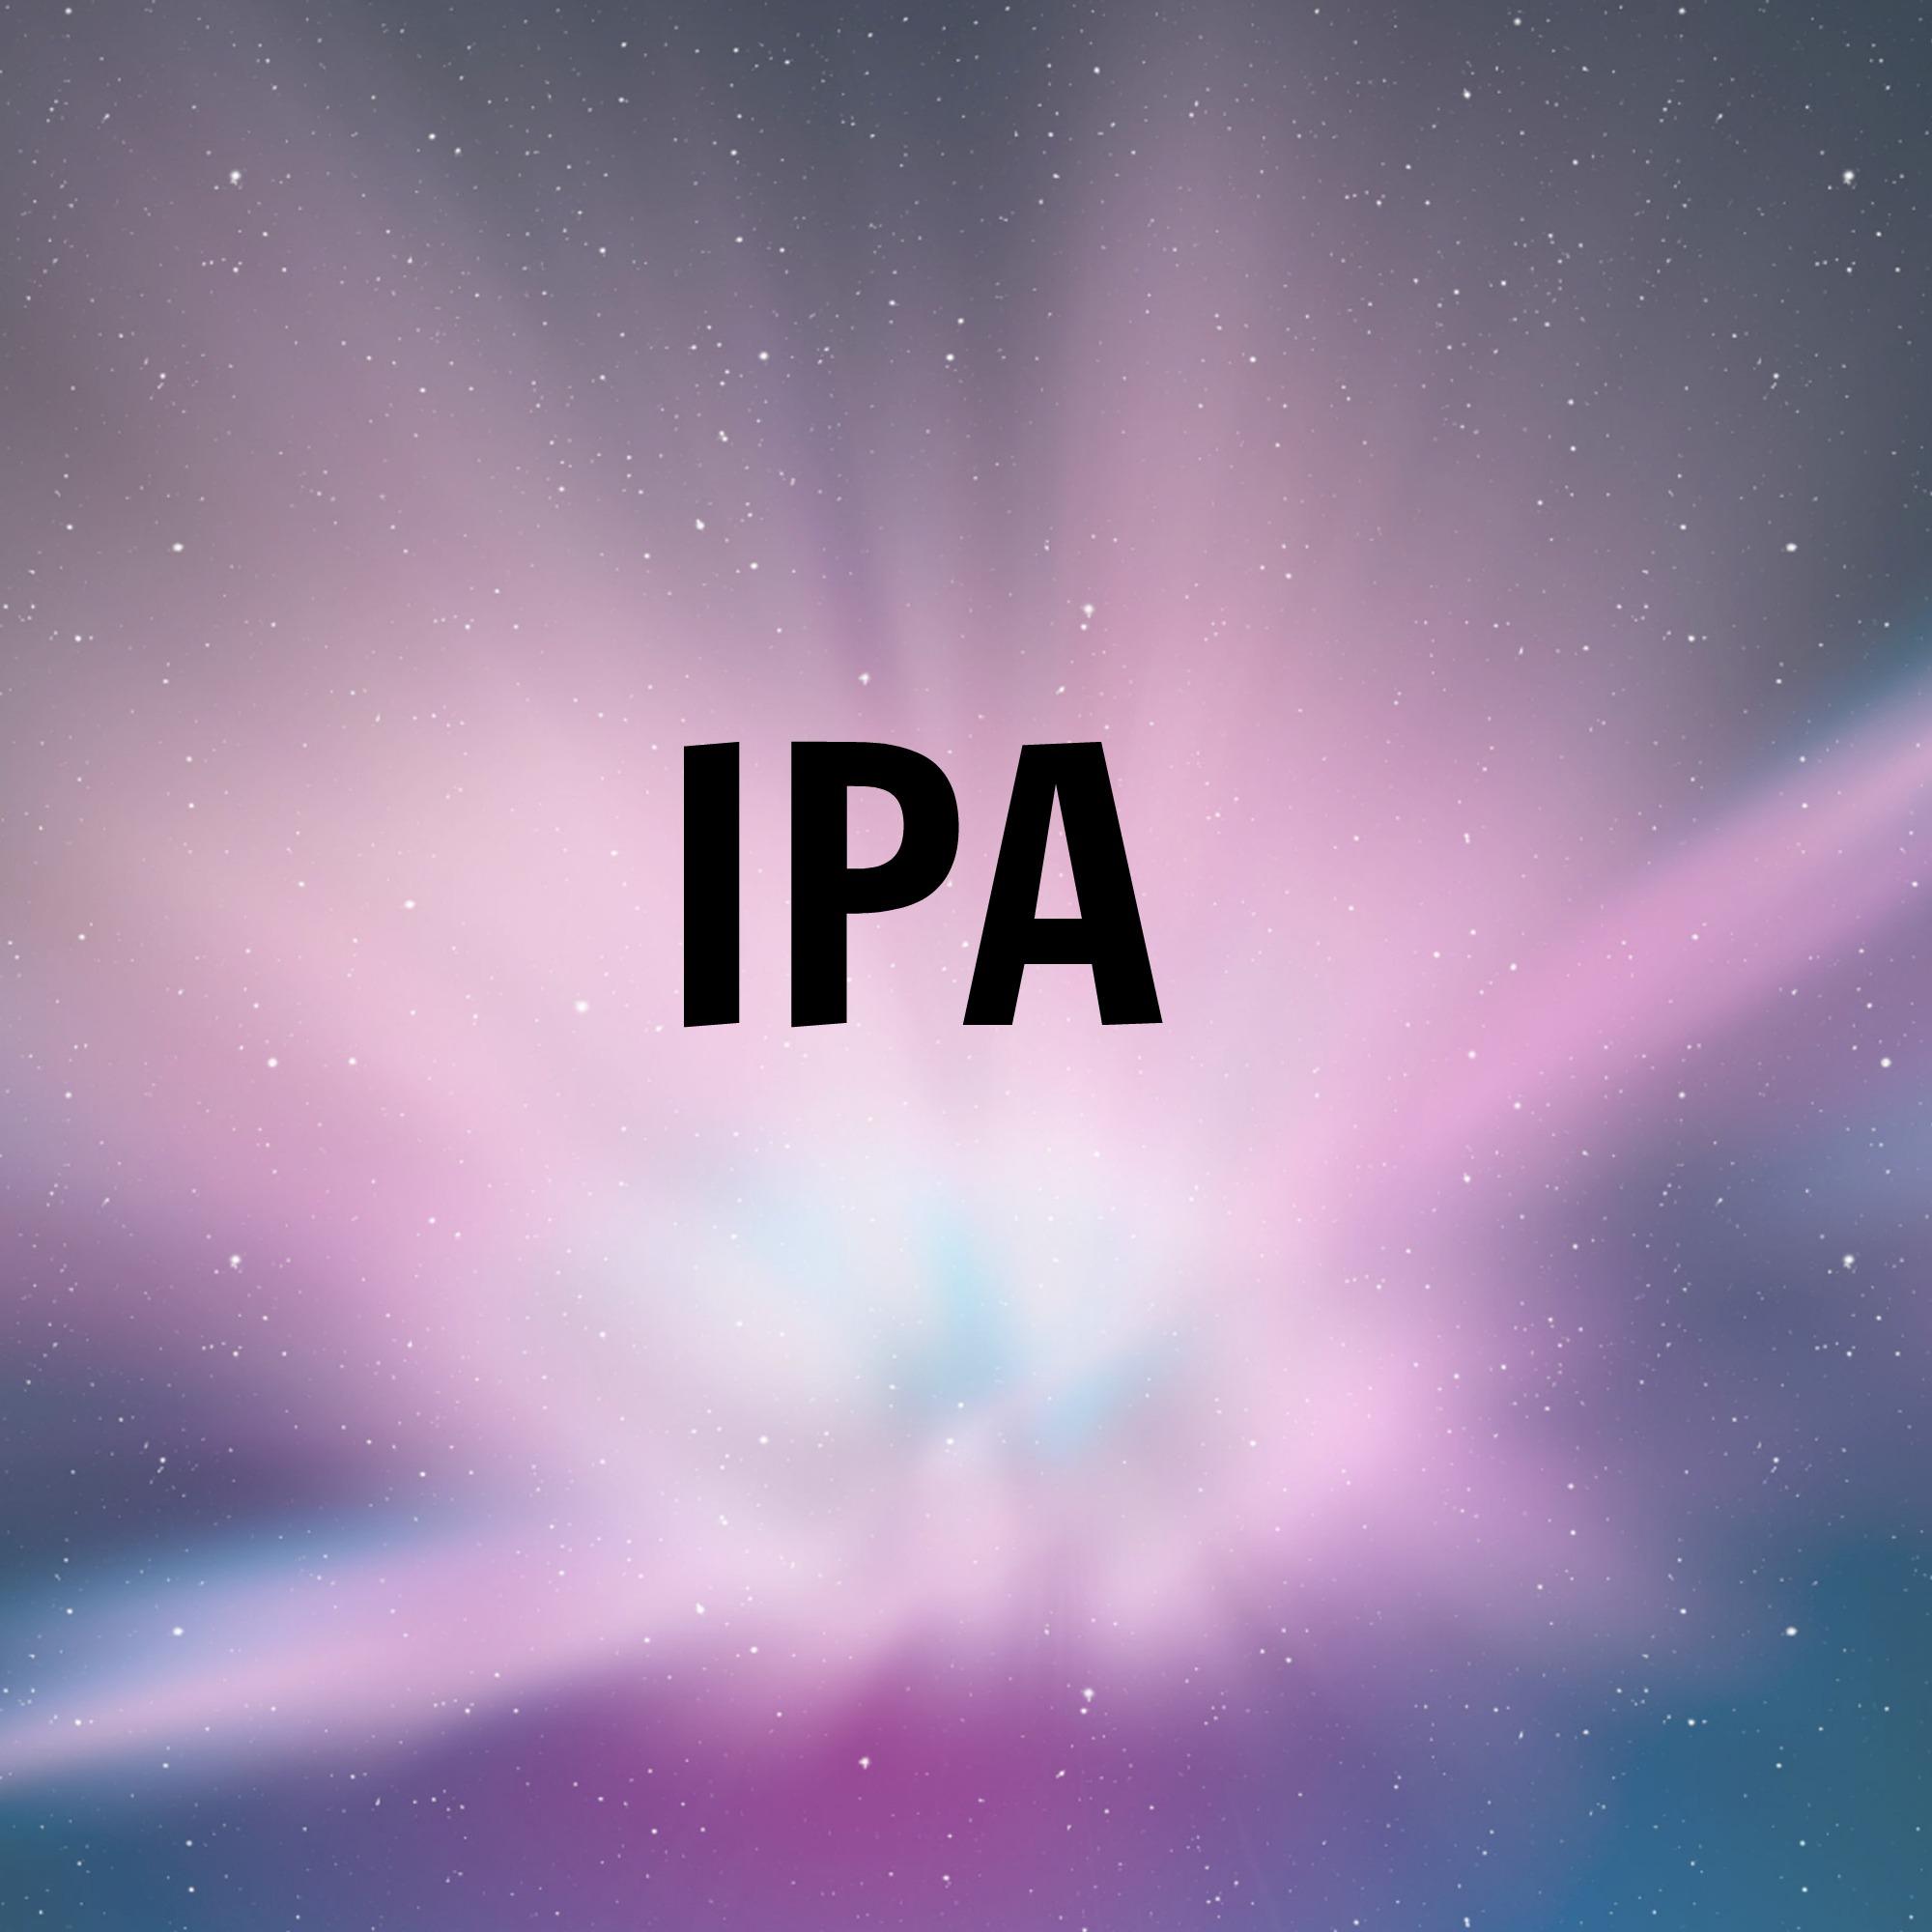 THE IPA PIC.jpg